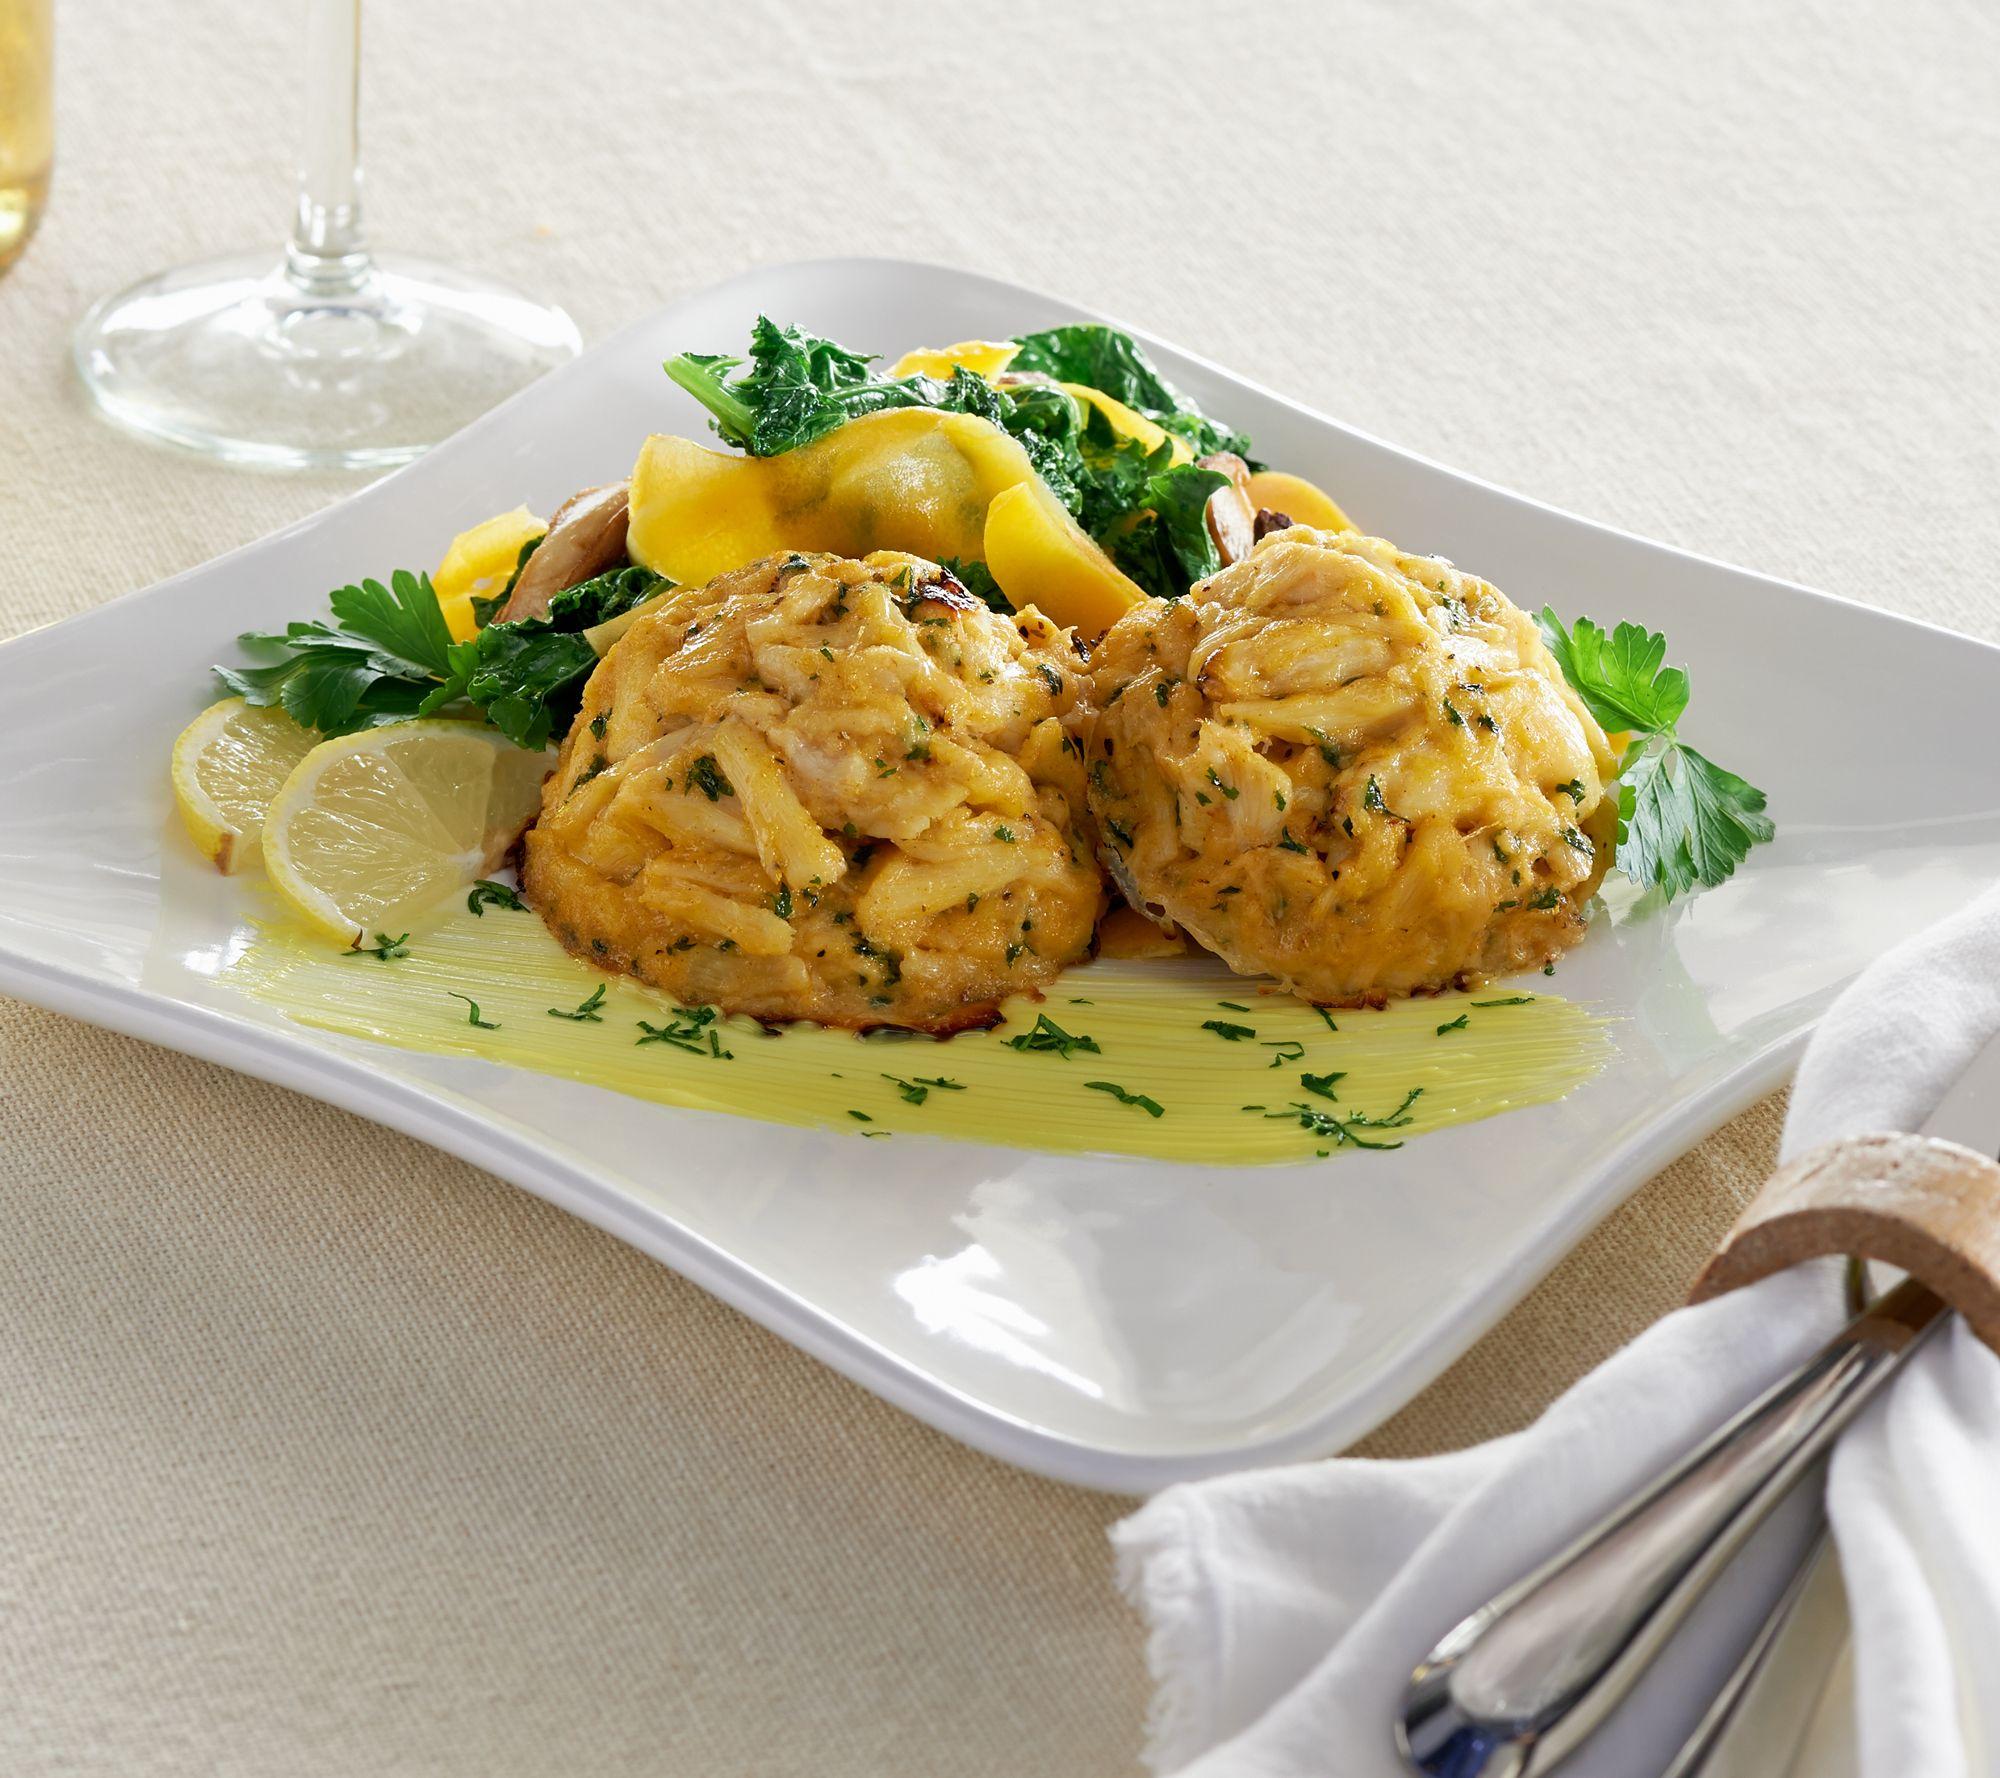 Blue apron qvc - Egg Harbor 10 4 Oz Jumbo Lump Crab Cakes Auto Delivery